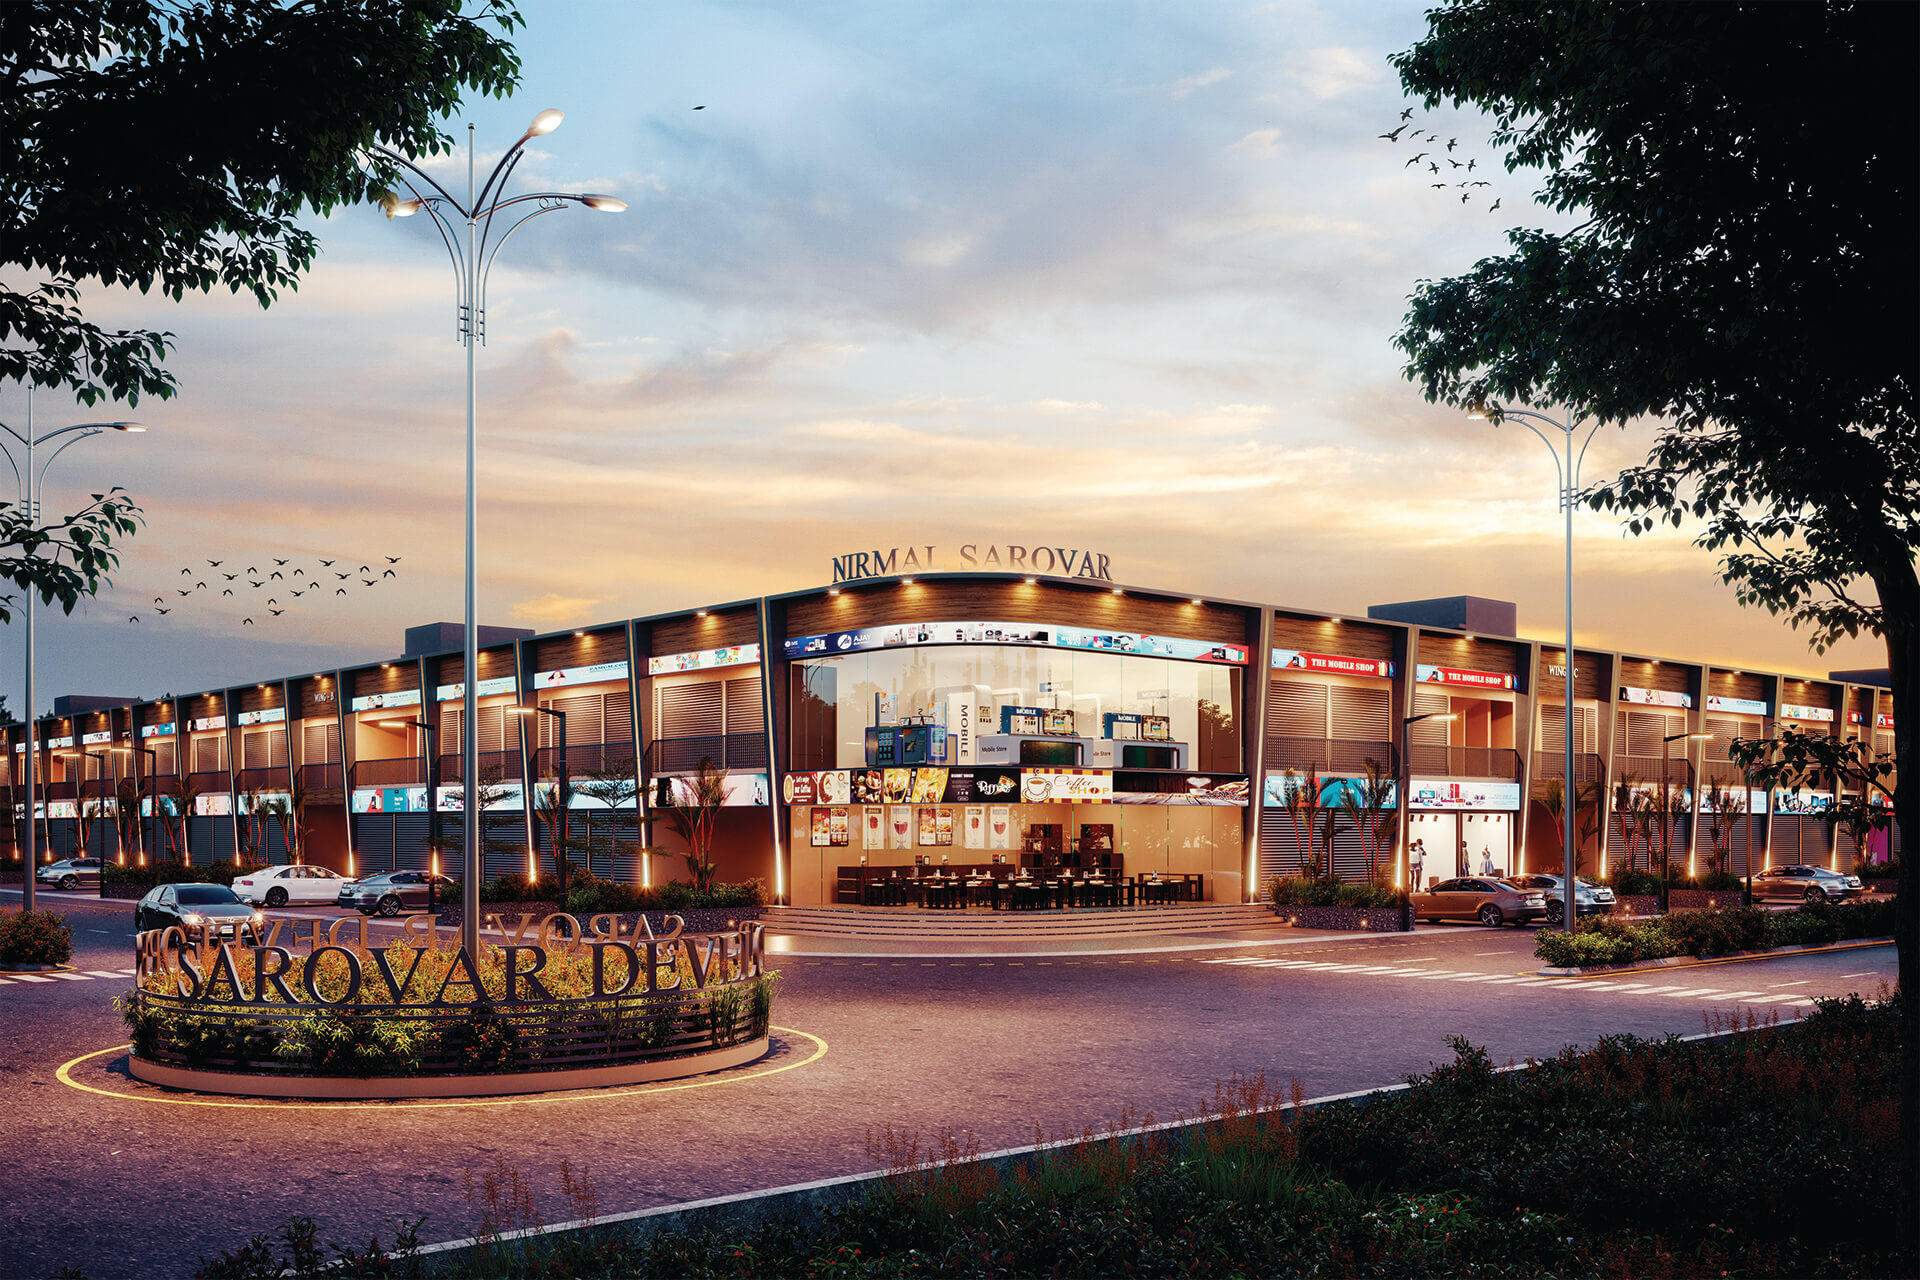 Nirmal Sarovar Commercial Hub